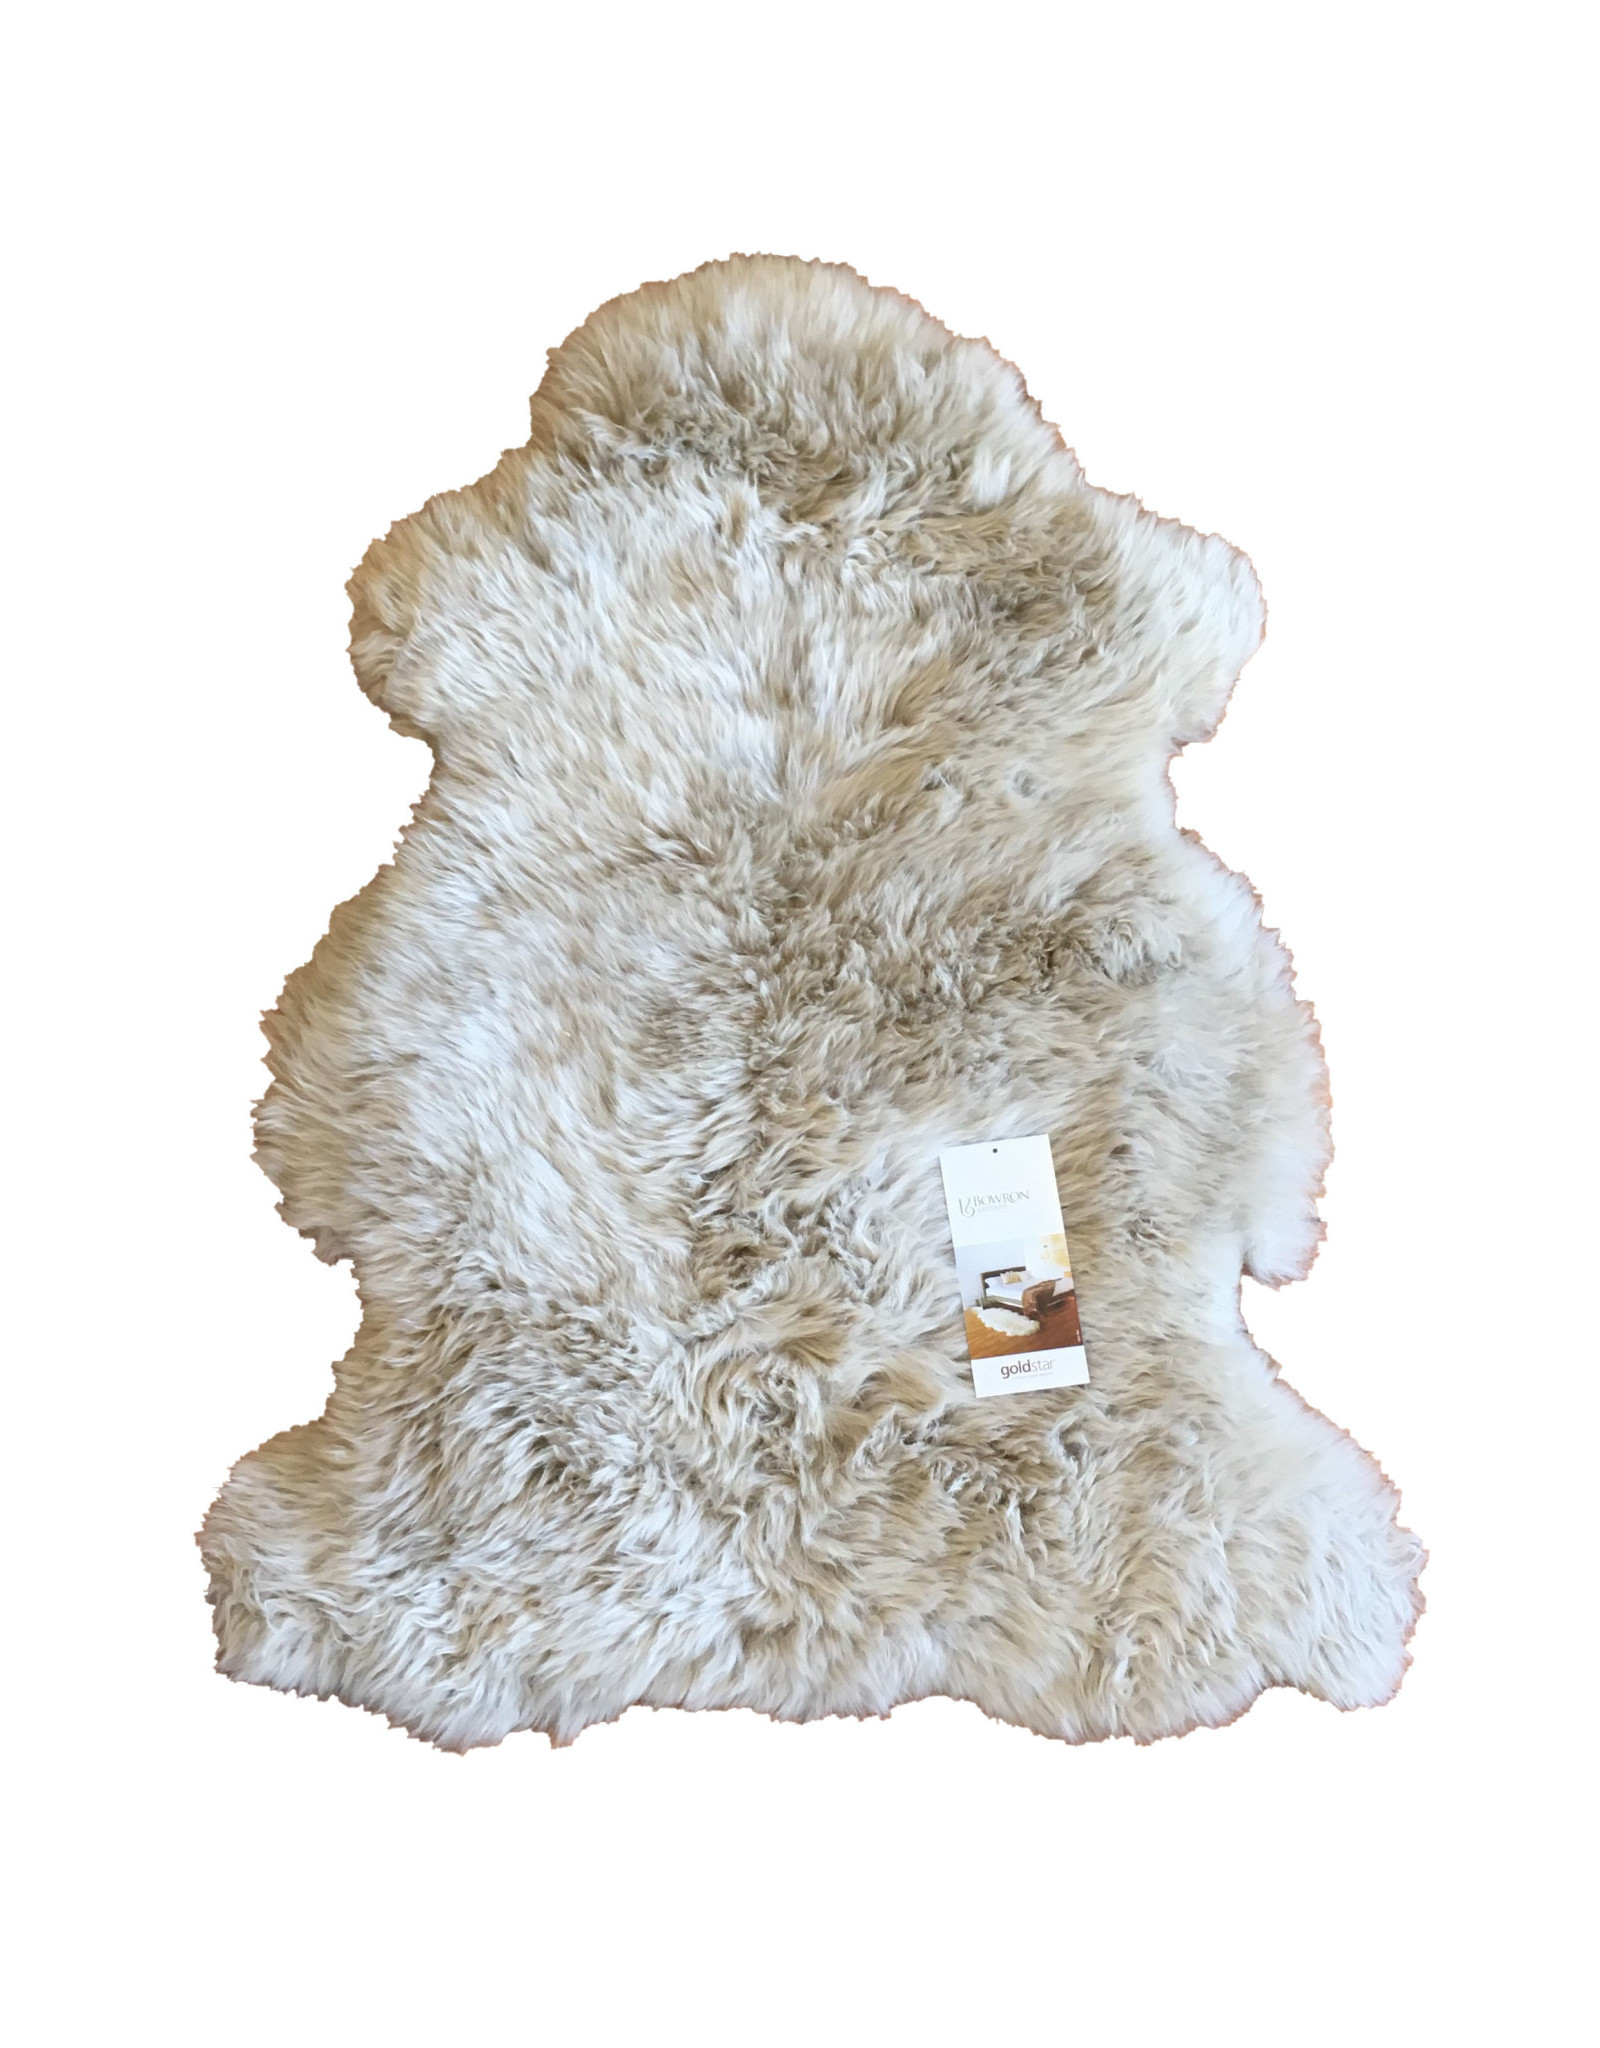 Sheepskin Rug - Stone - Single